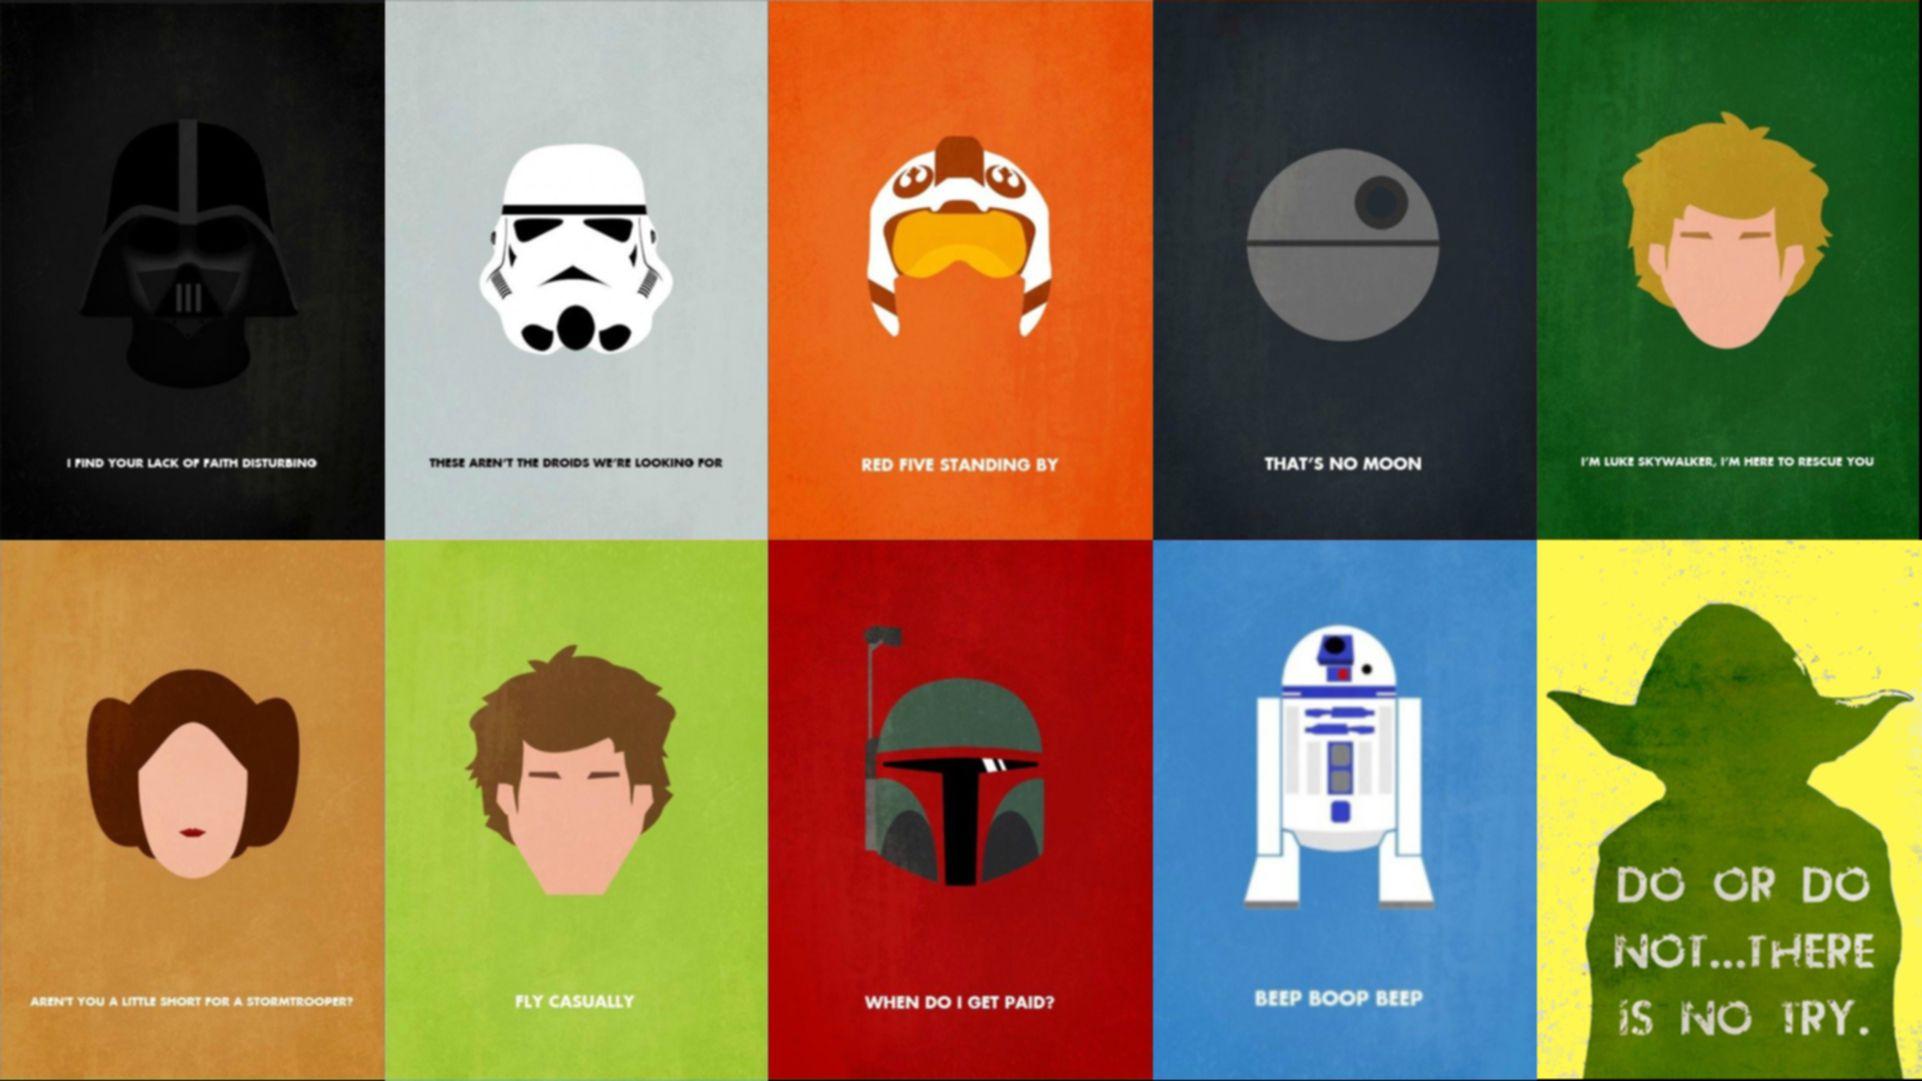 Star Wars Quote In HD HD Desktop Wallpaper, Instagram